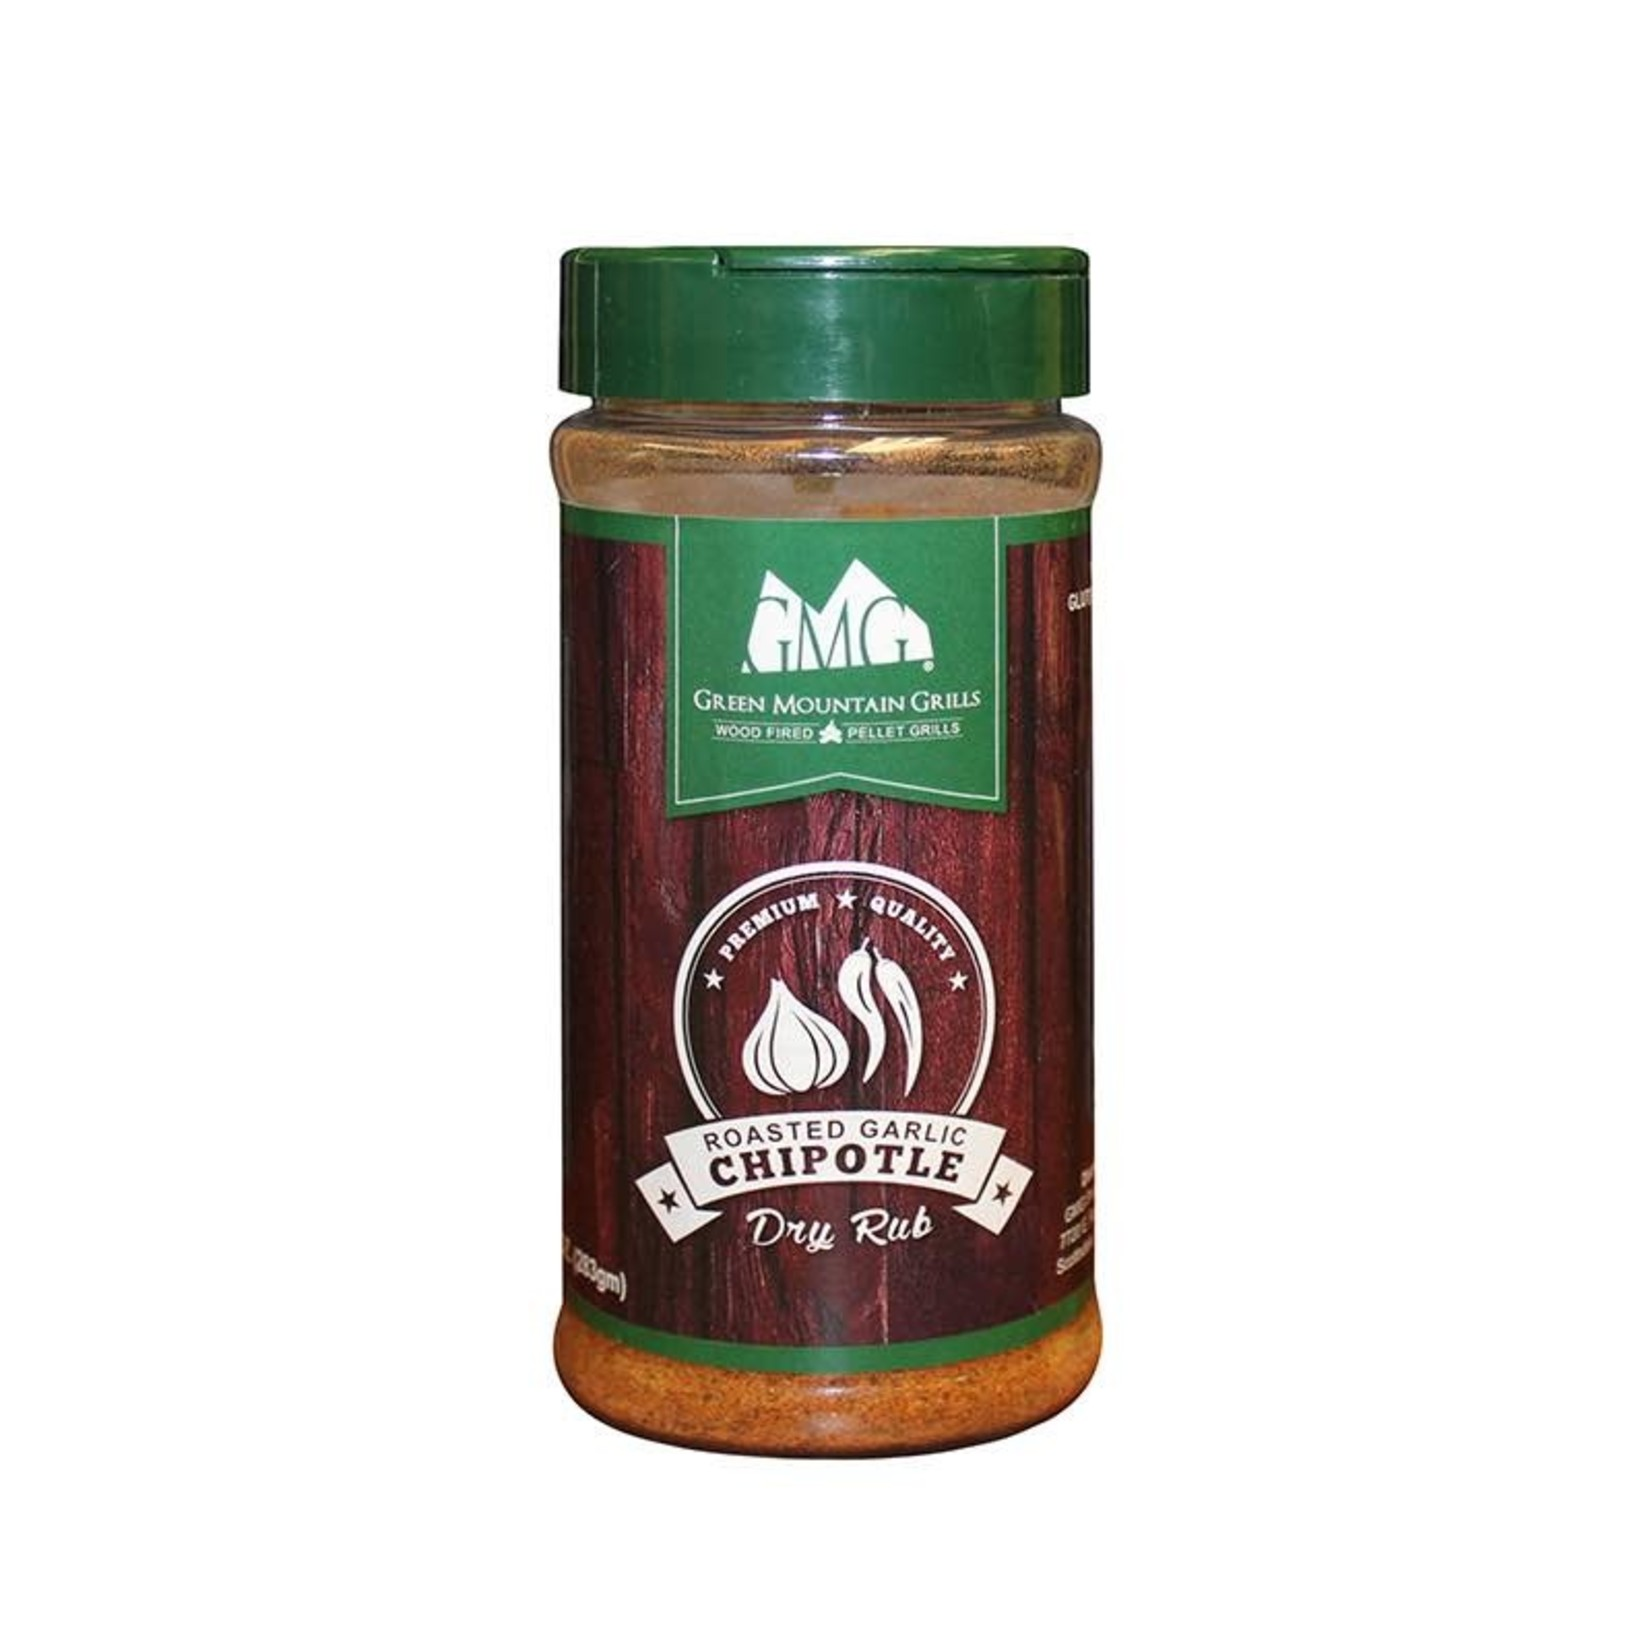 Green Mountain Grill GMG  Roasted Garlic & Chipotle Rub